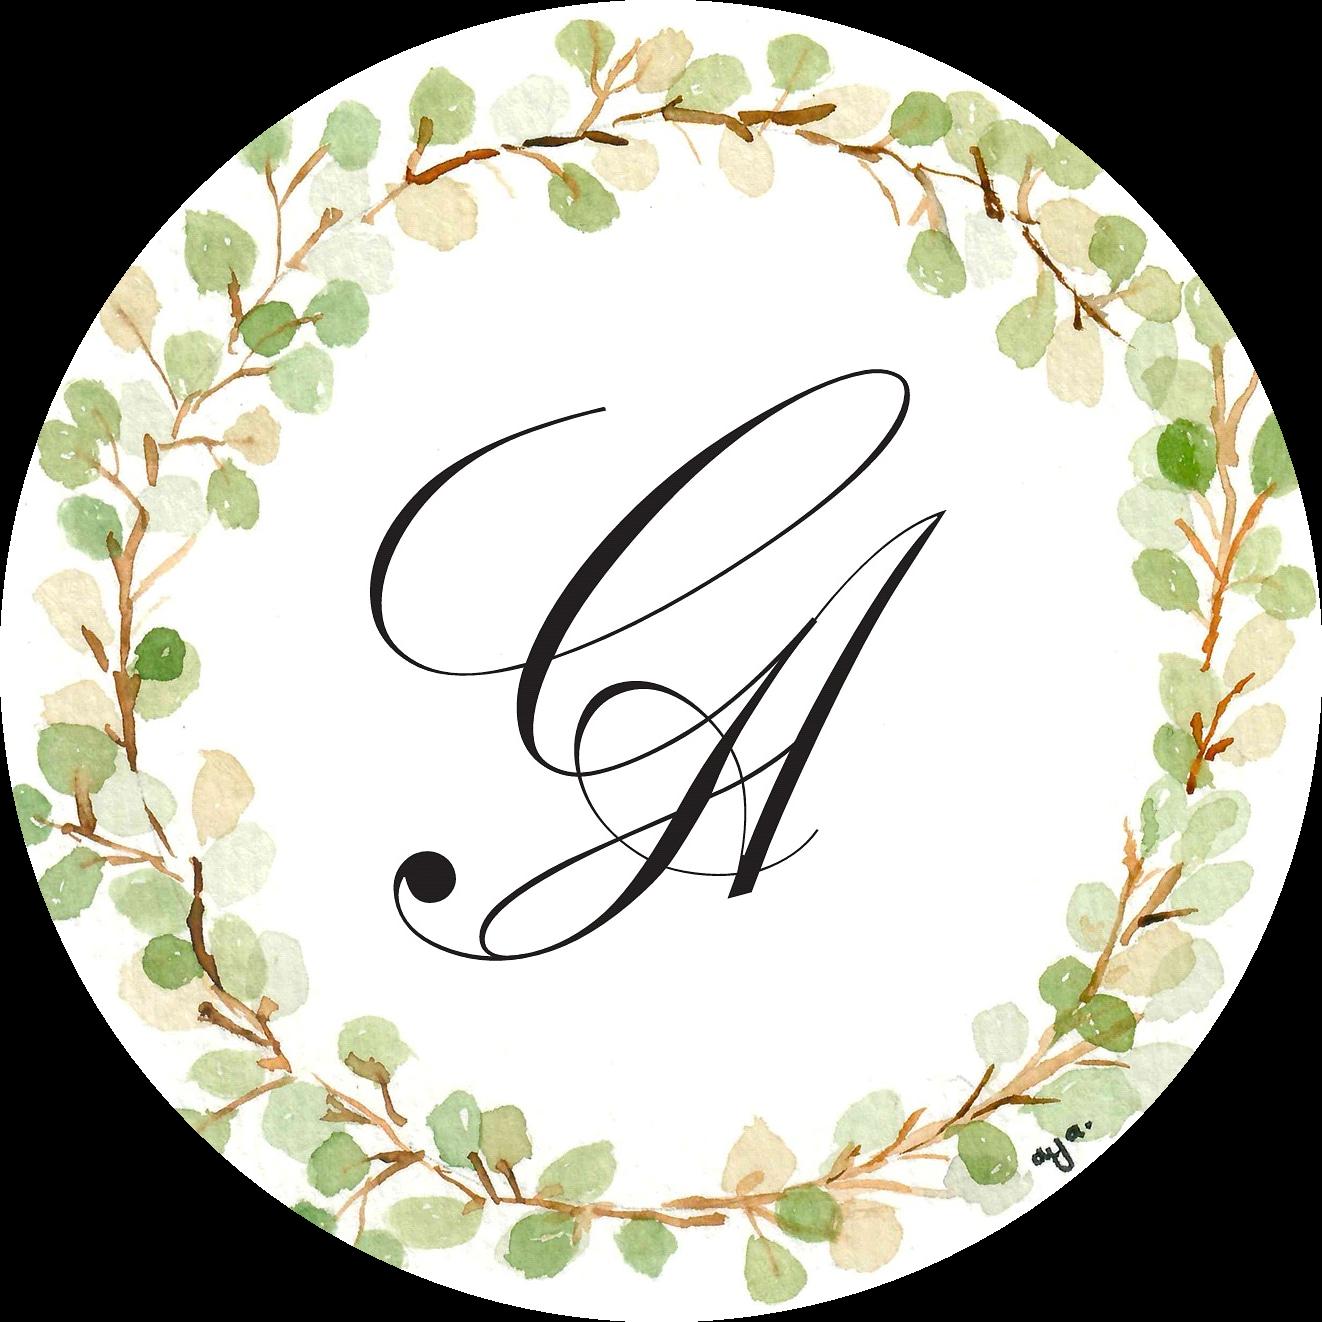 Gnadia Artwork (gnadiaartwork) Profile Image   Linktree